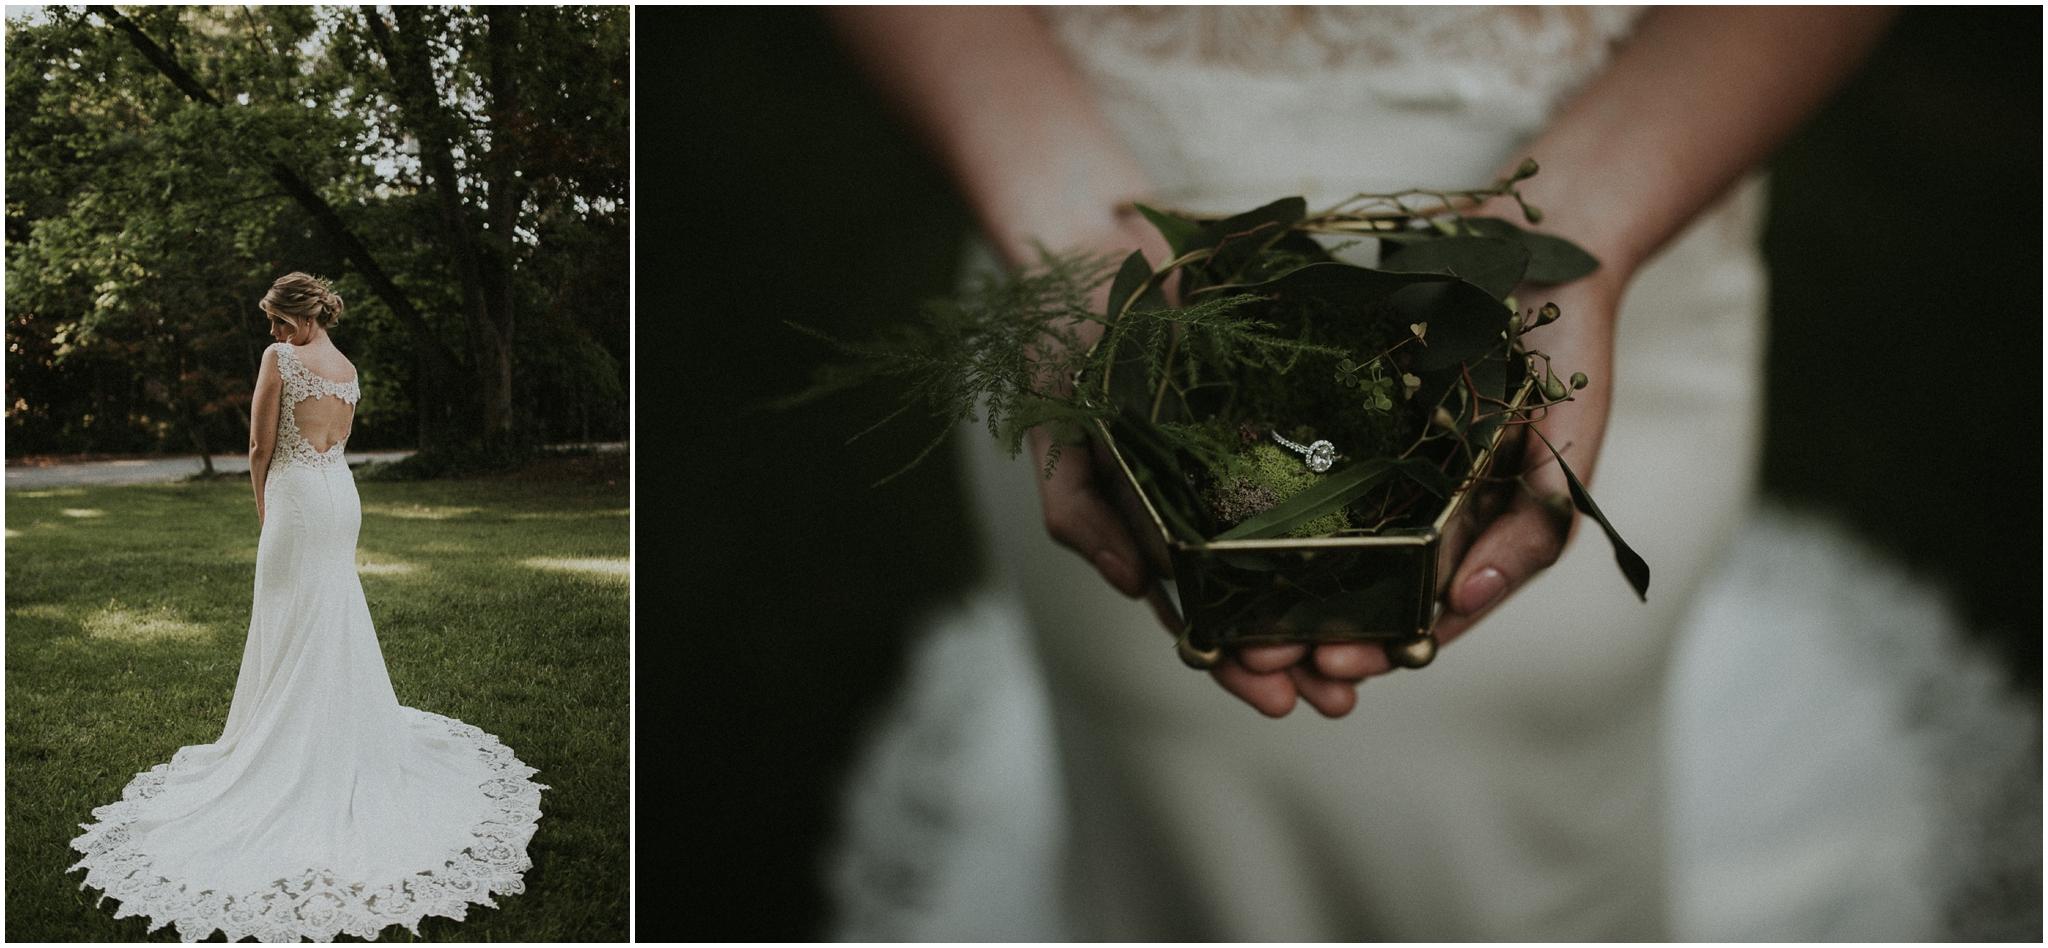 Wedding-photographer-ritchie-hill_0023.jpg